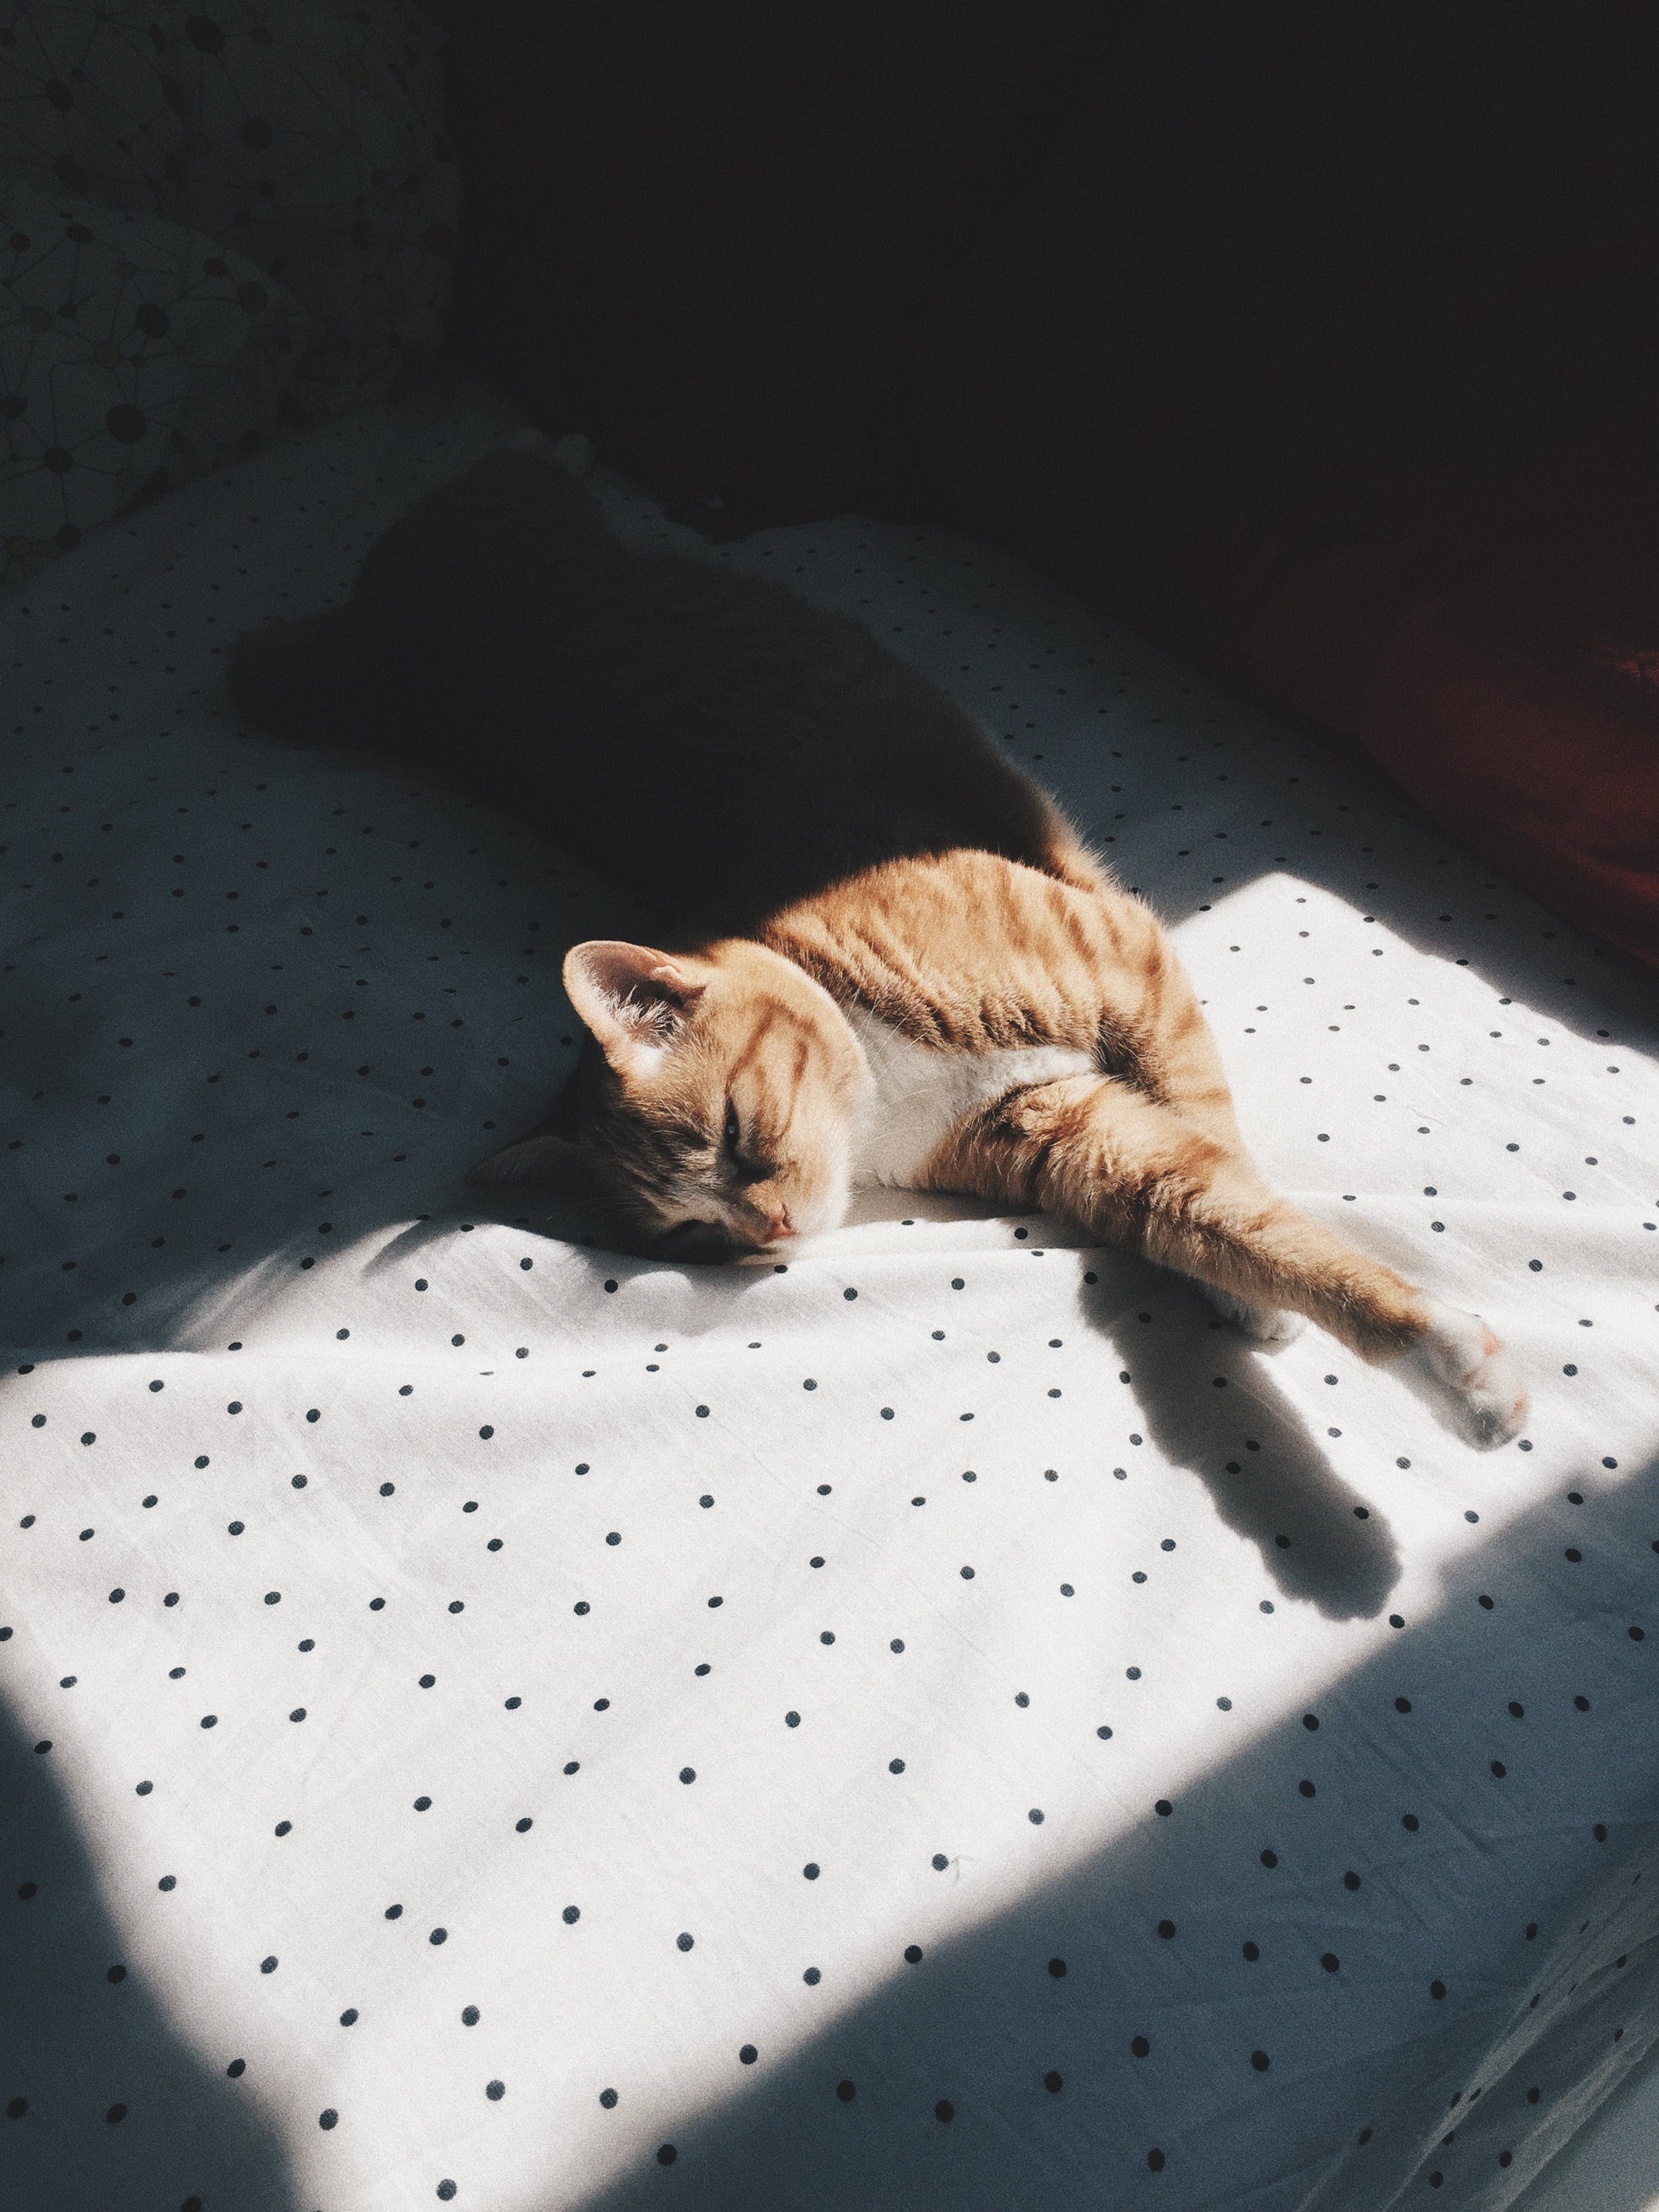 Free stock photo of bed, cat, polka dots, ray of sunshine